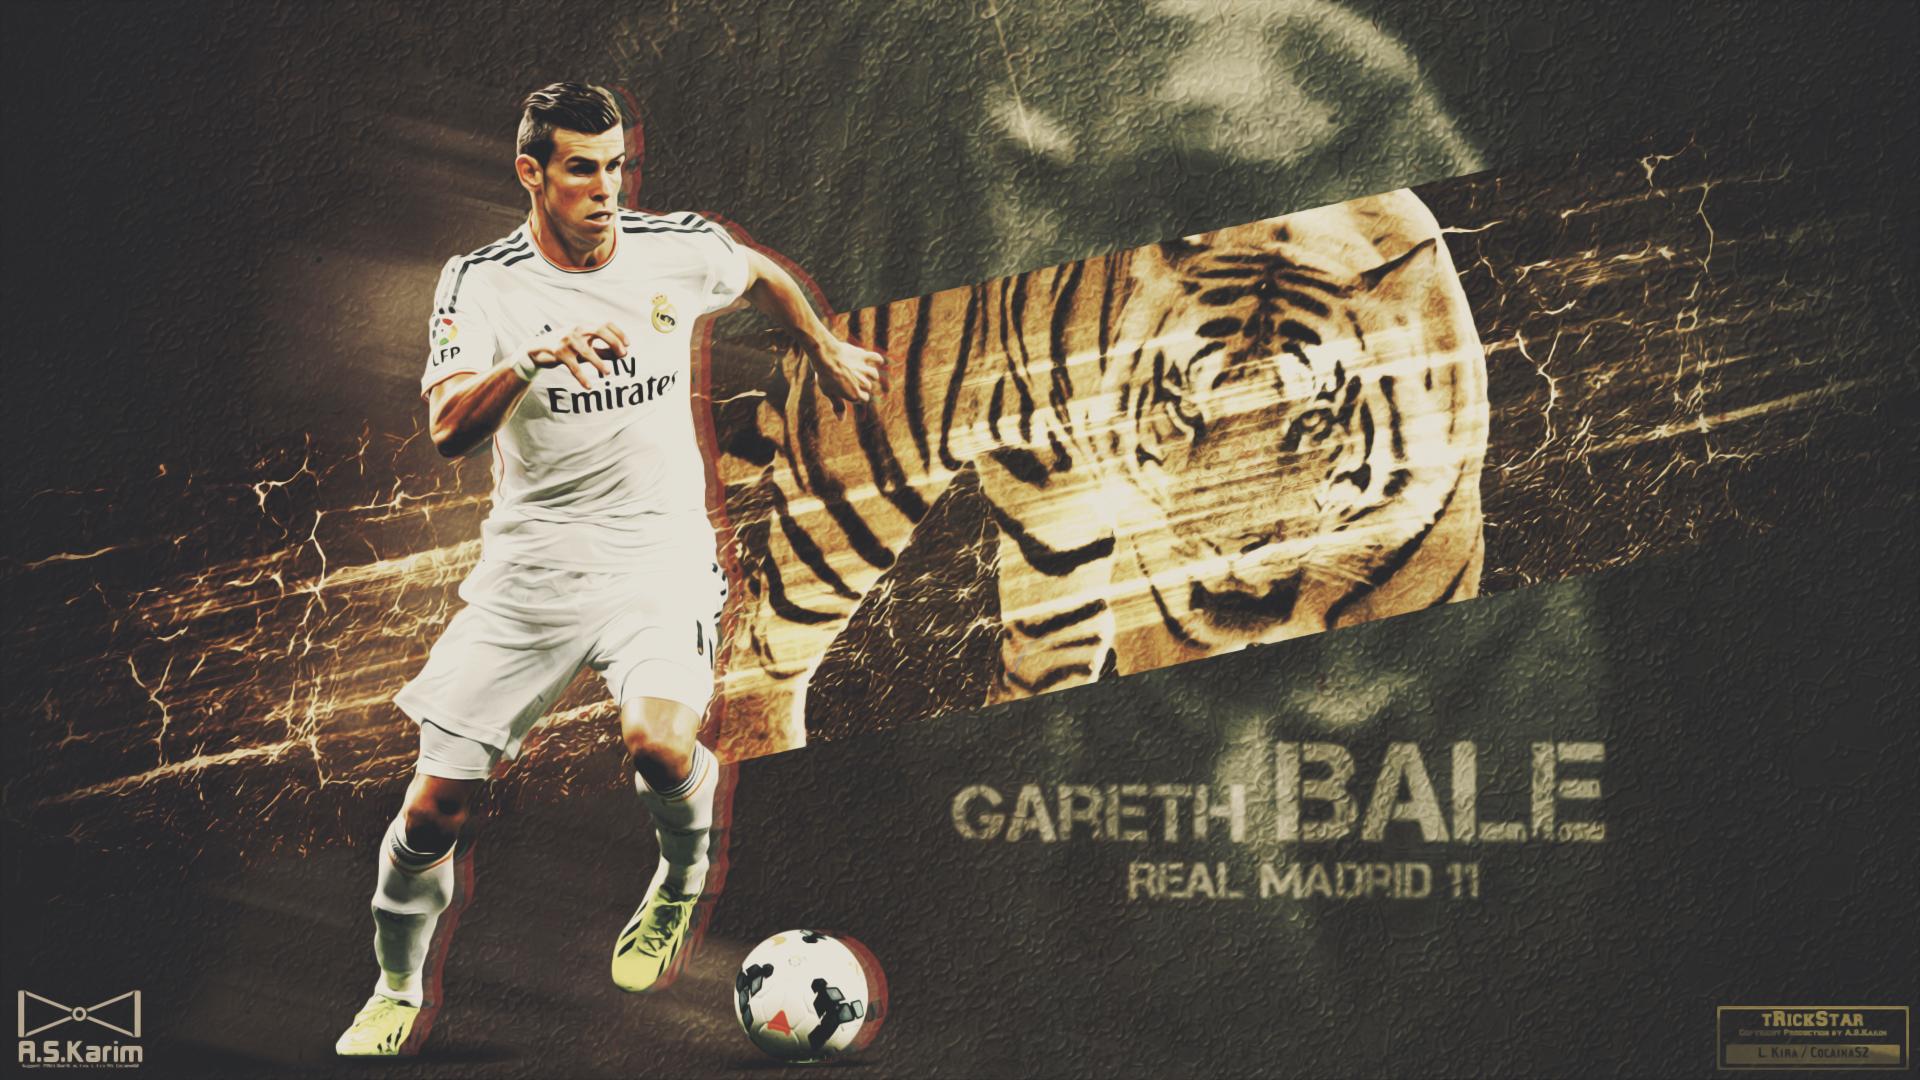 Gareth Bale Wallpaper 3